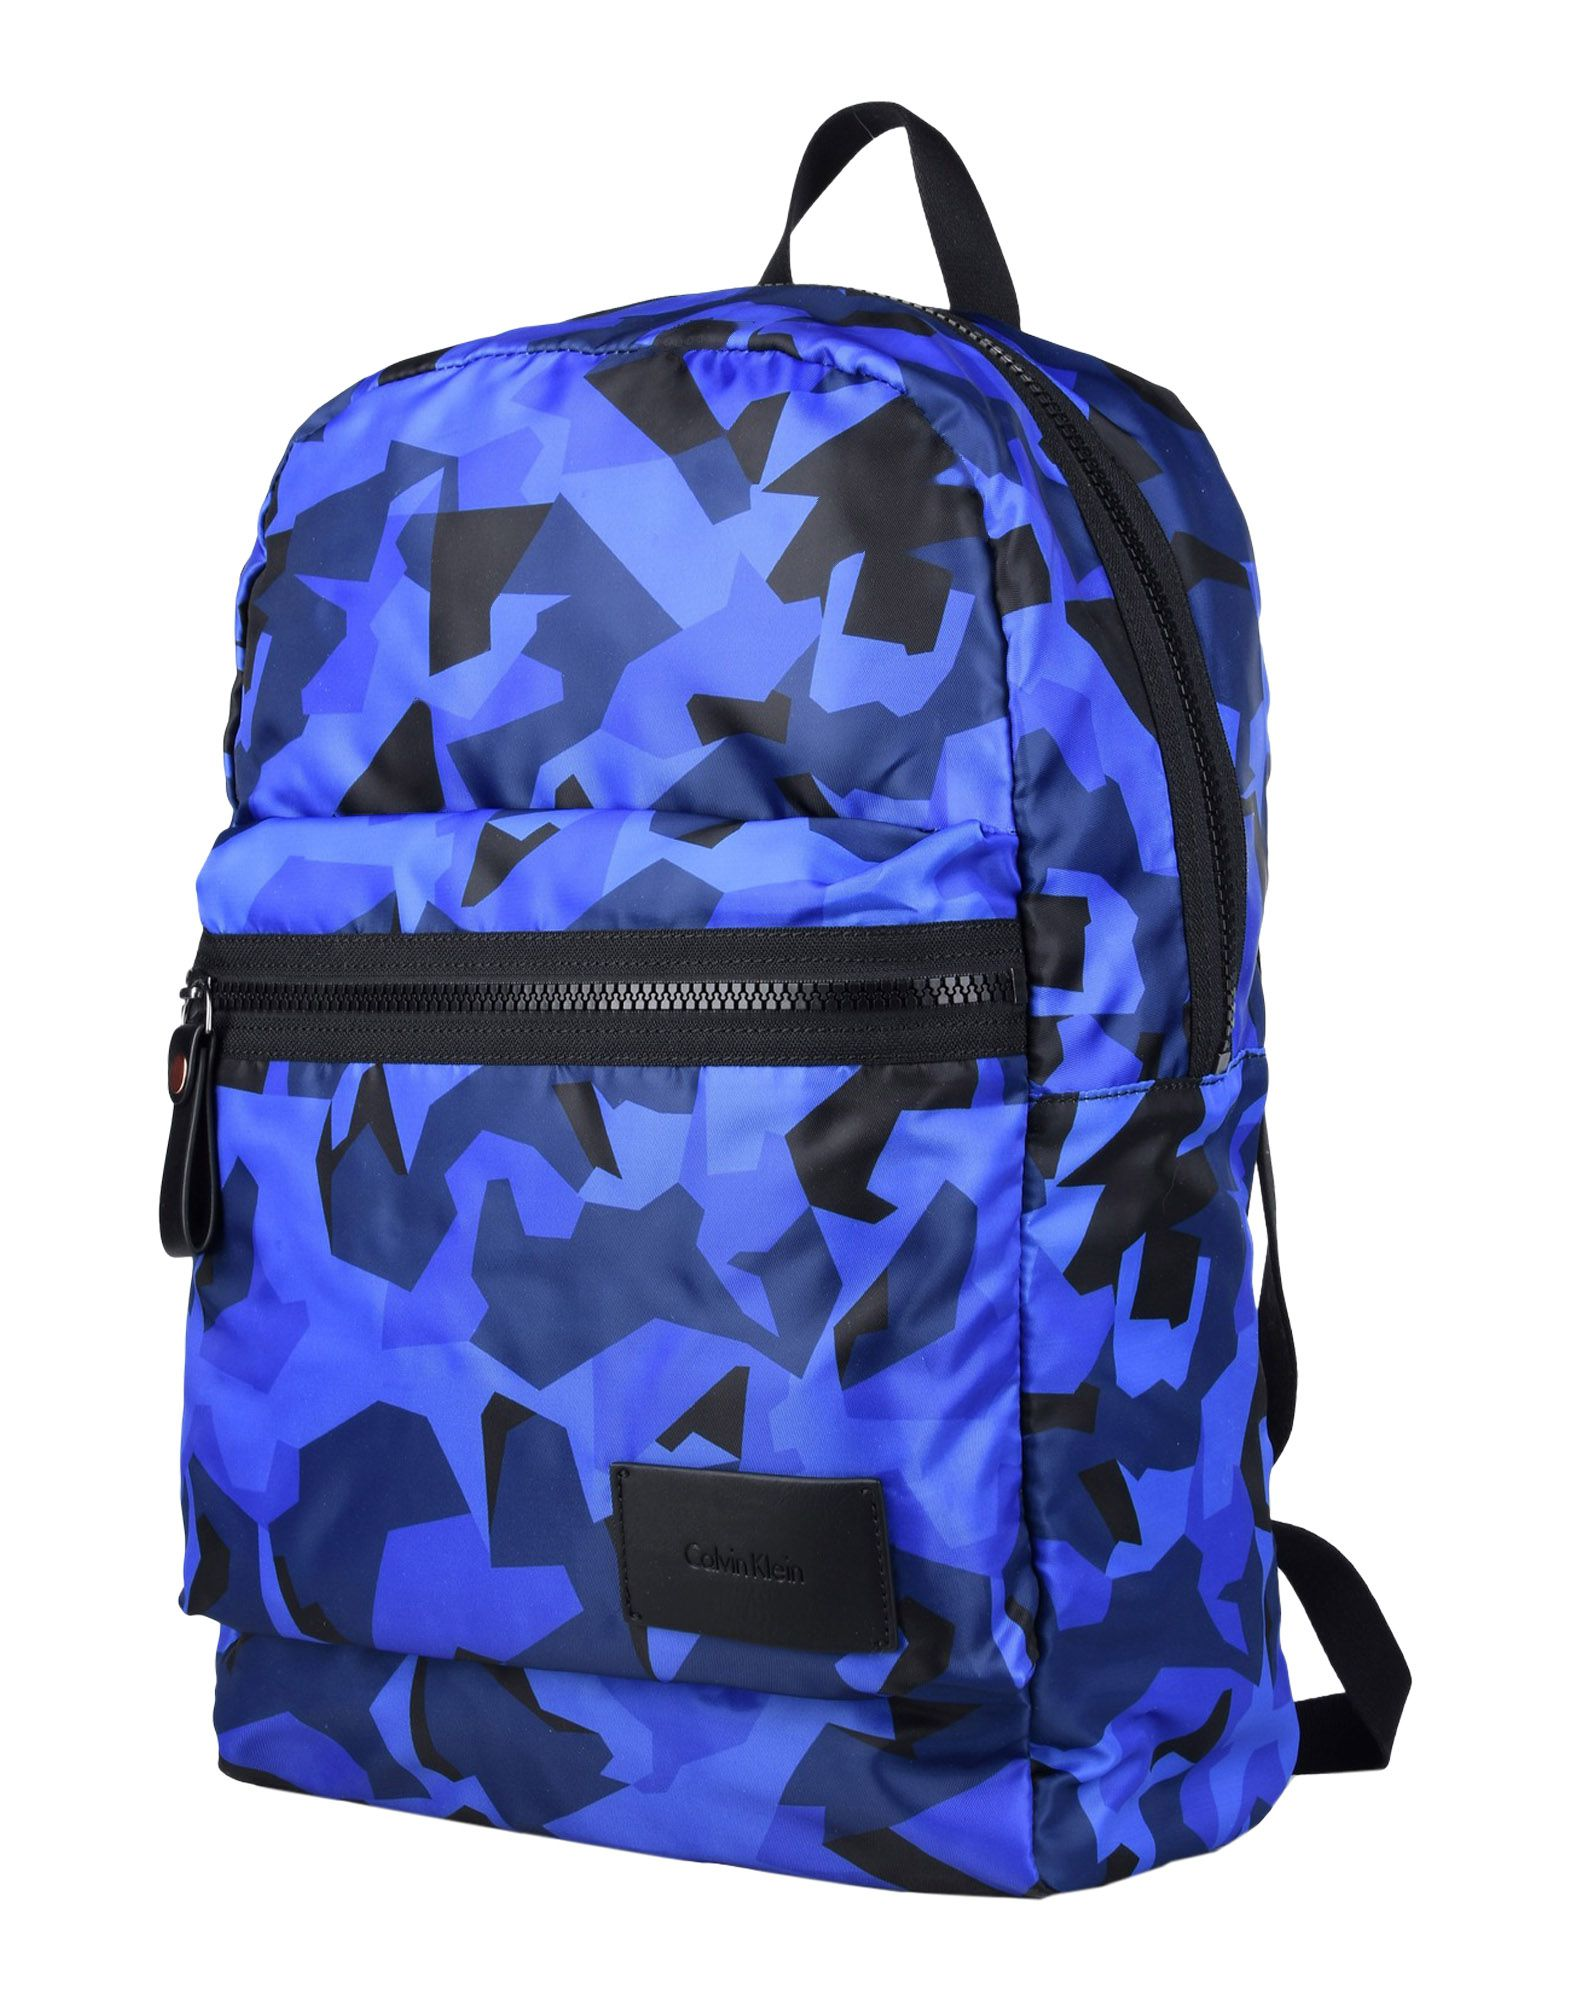 купить CALVIN KLEIN JEANS Рюкзаки и сумки на пояс по цене 12000 рублей